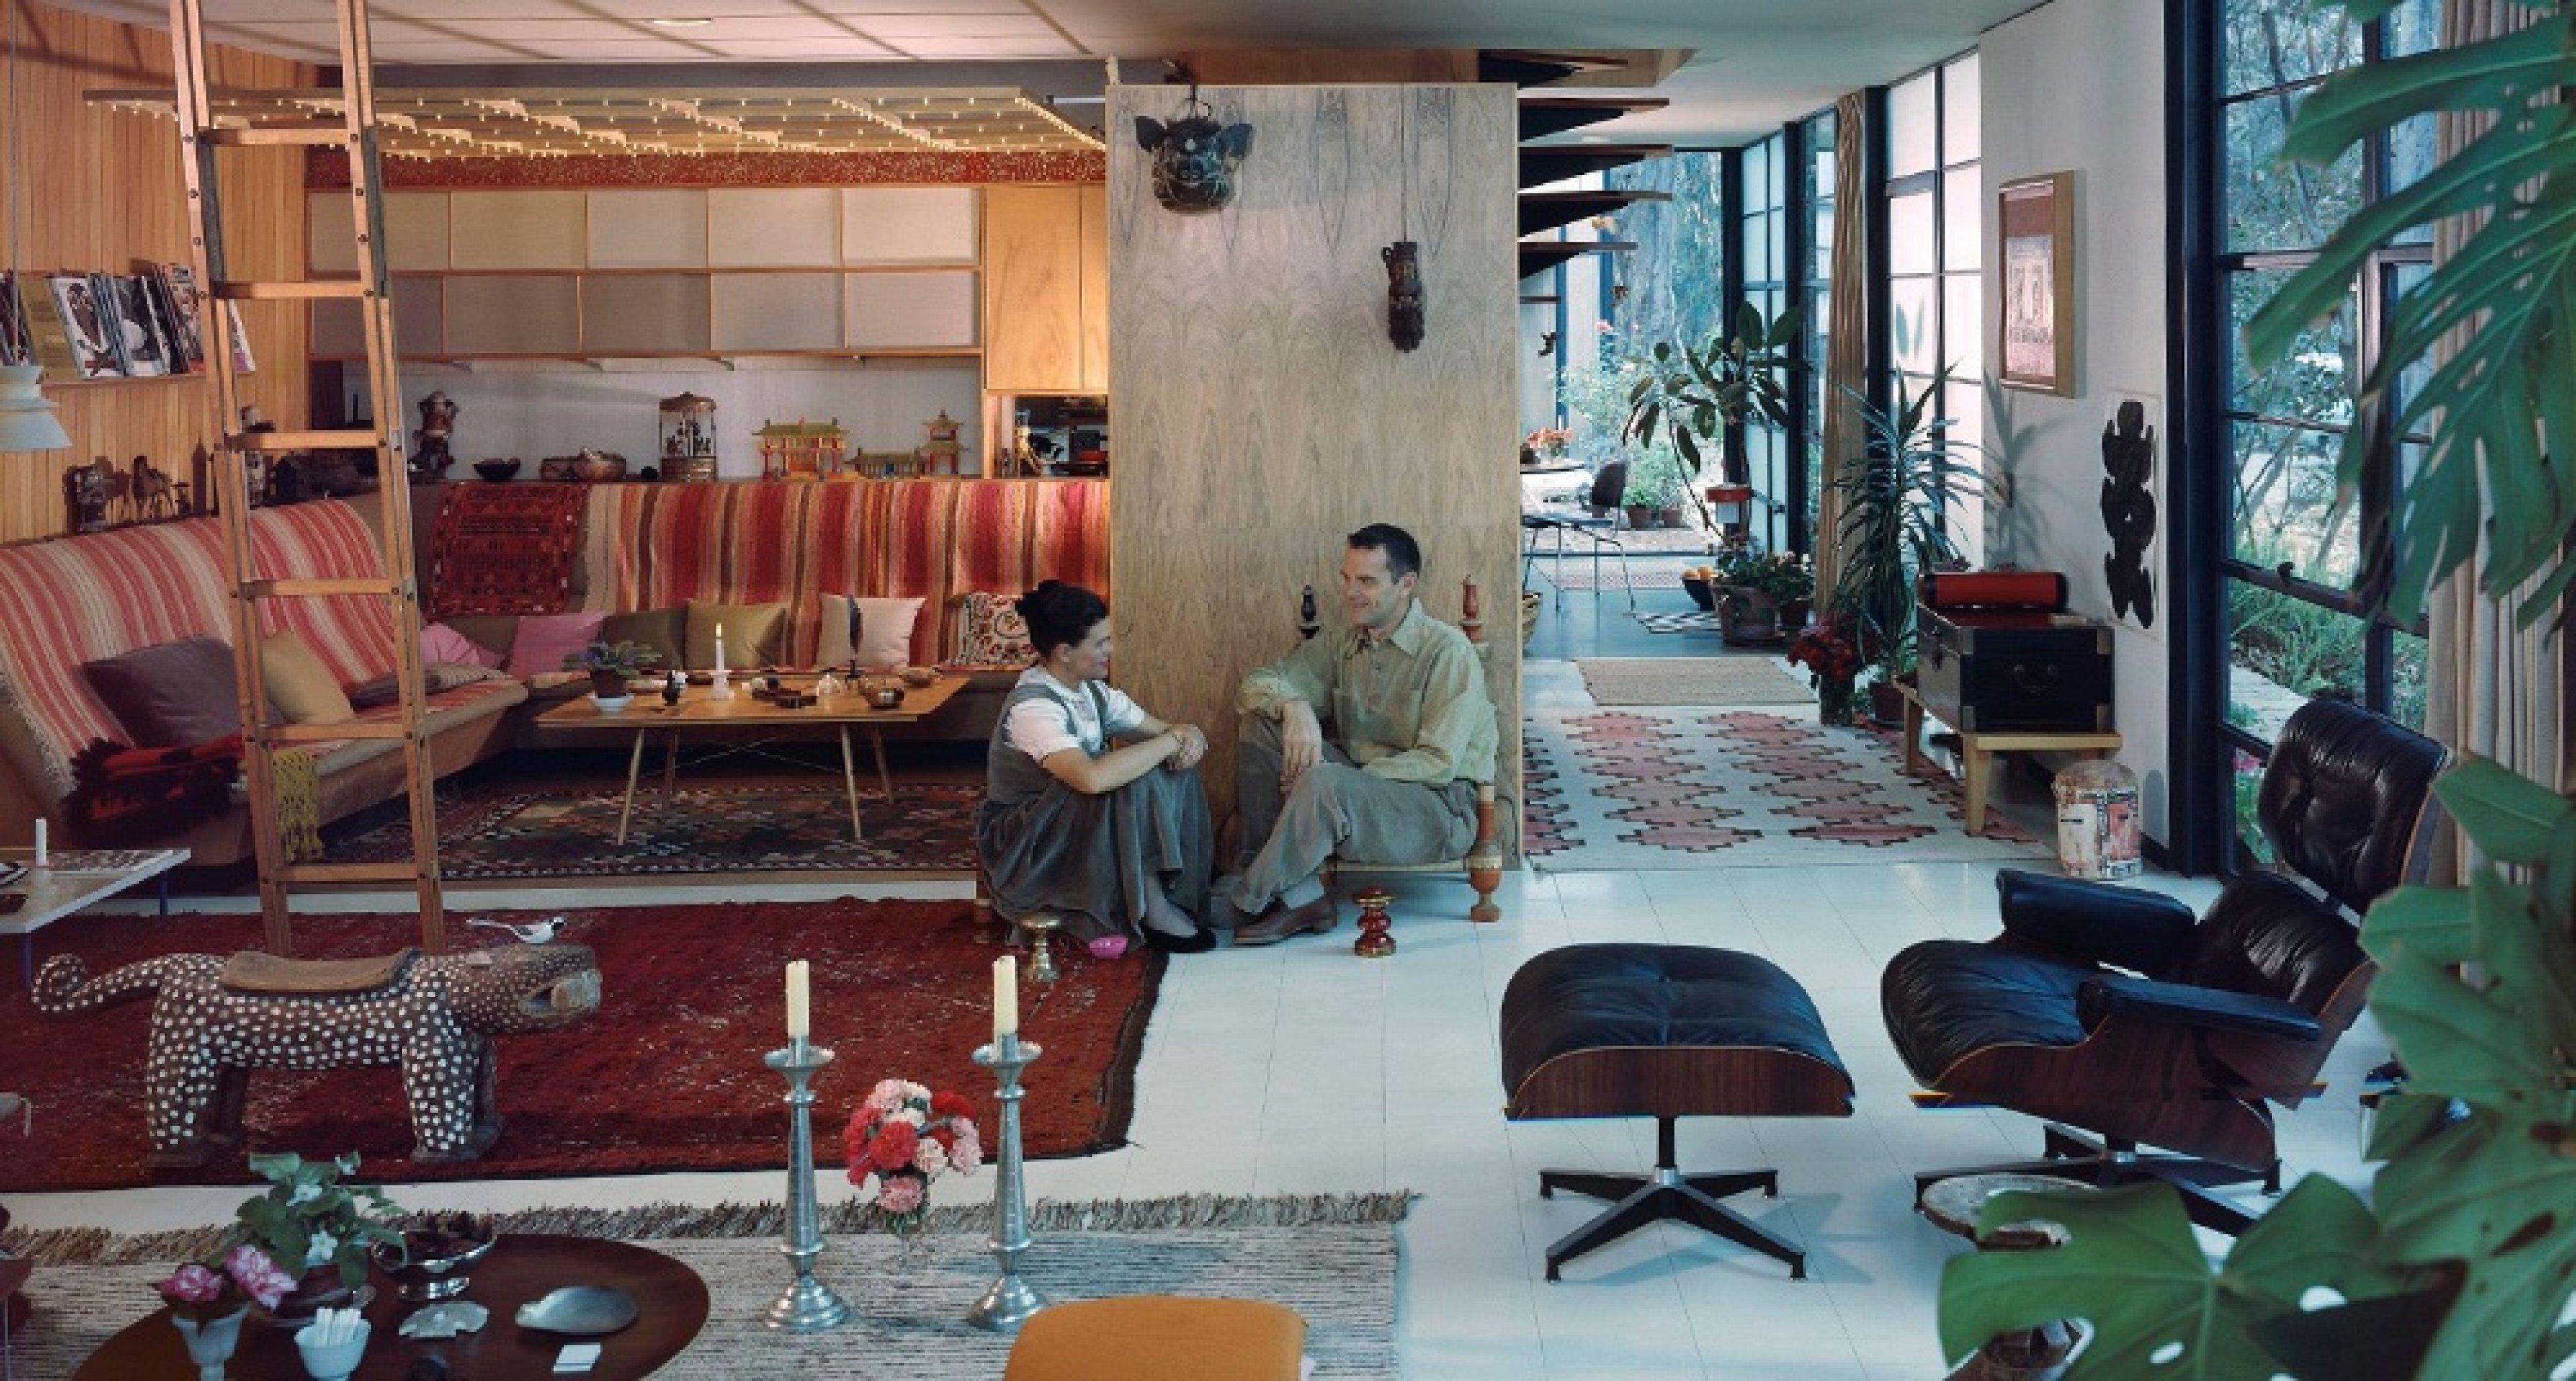 Charles and Ray im Wohnzimmer des Eames House, 1958 © J. Paul Getty Trust, Los Angeles, Foto: Julius Shulman